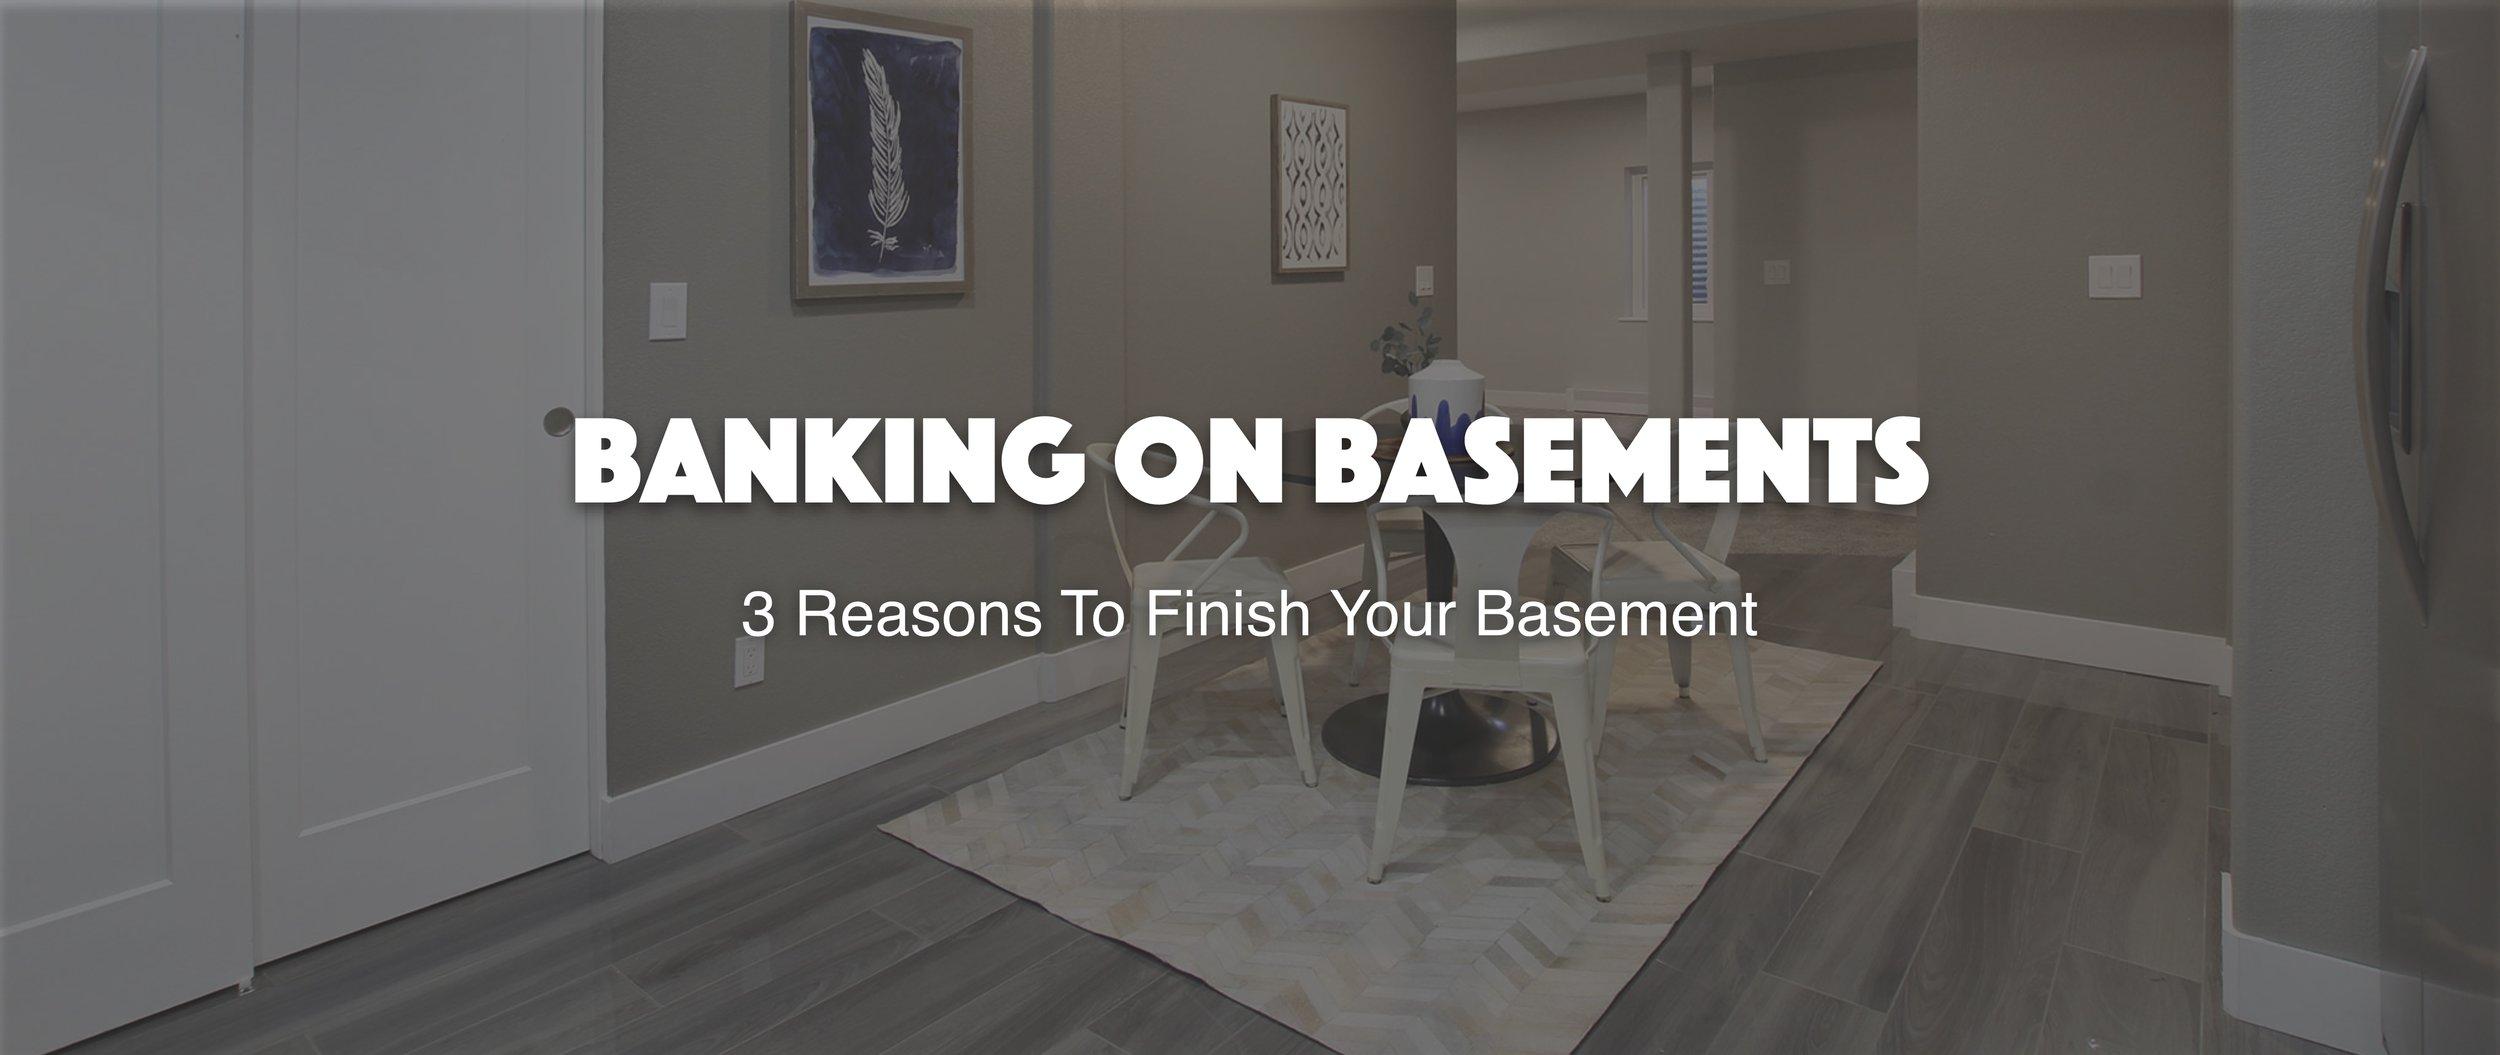 MHC_blogbanner_basements.jpg